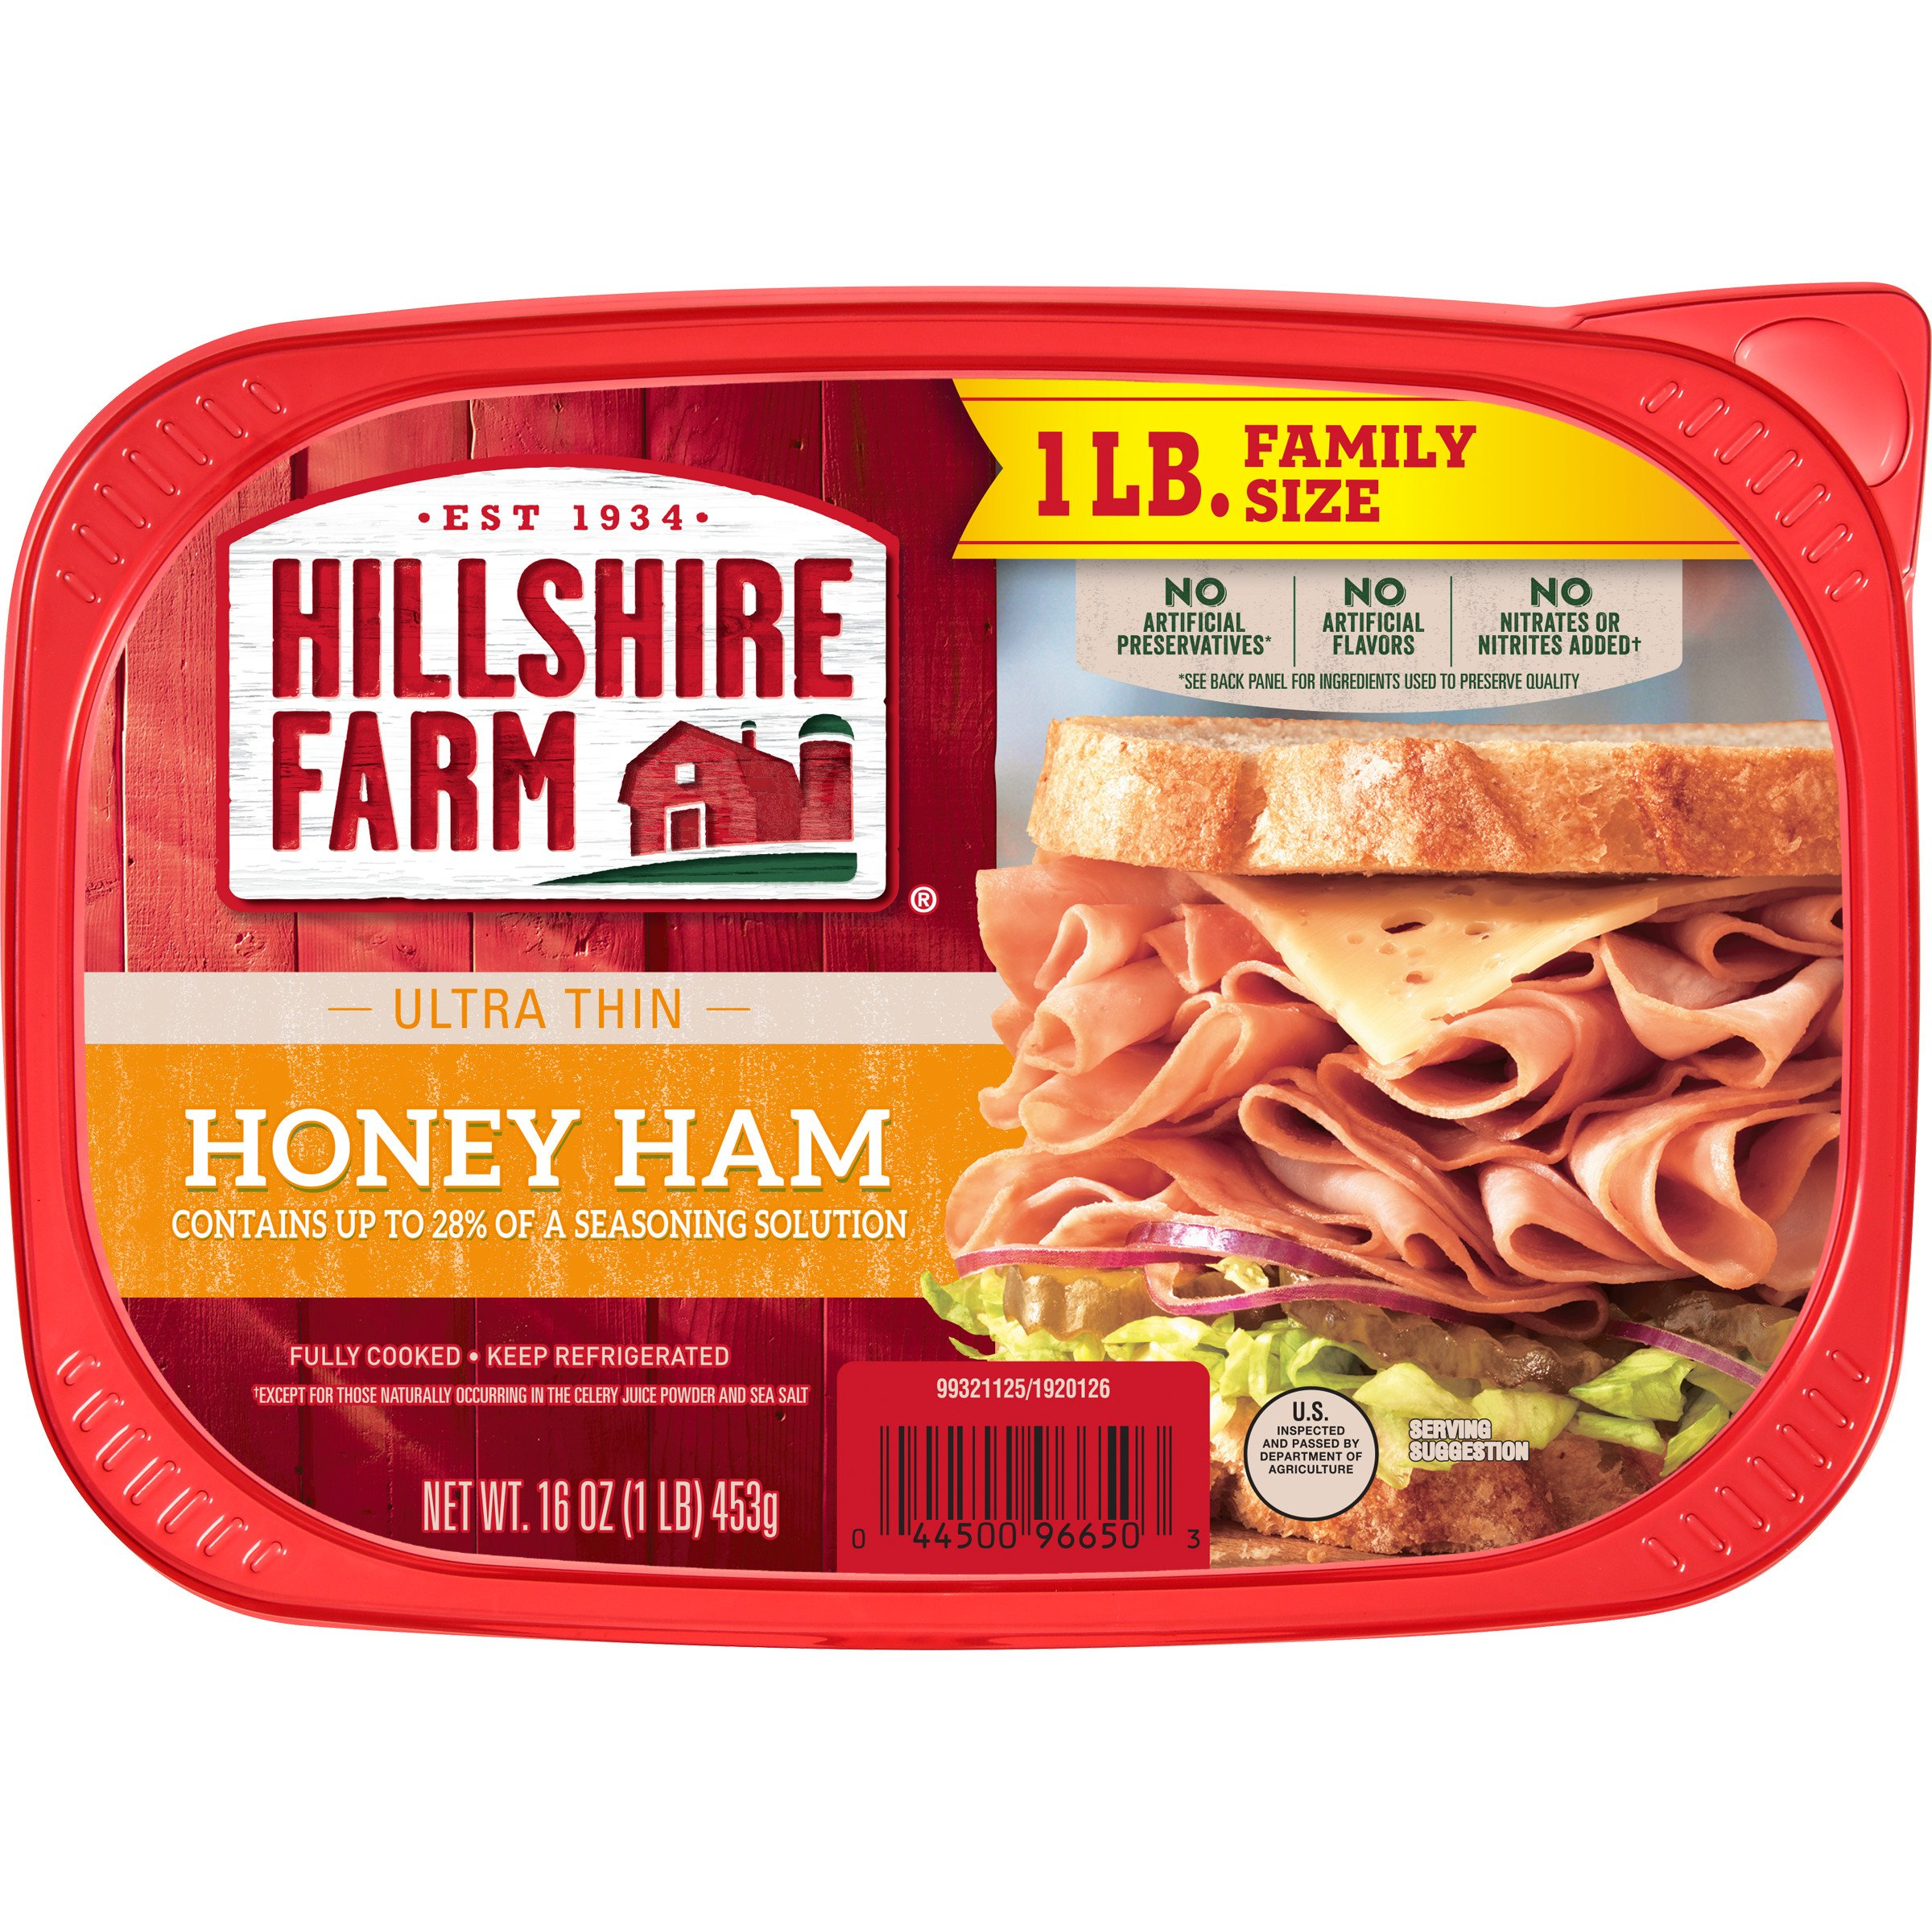 Hillshire Farm Ultra Thin Sliced Lunchmeat Honey Ham ‑ Shop Meat at H‑E‑B